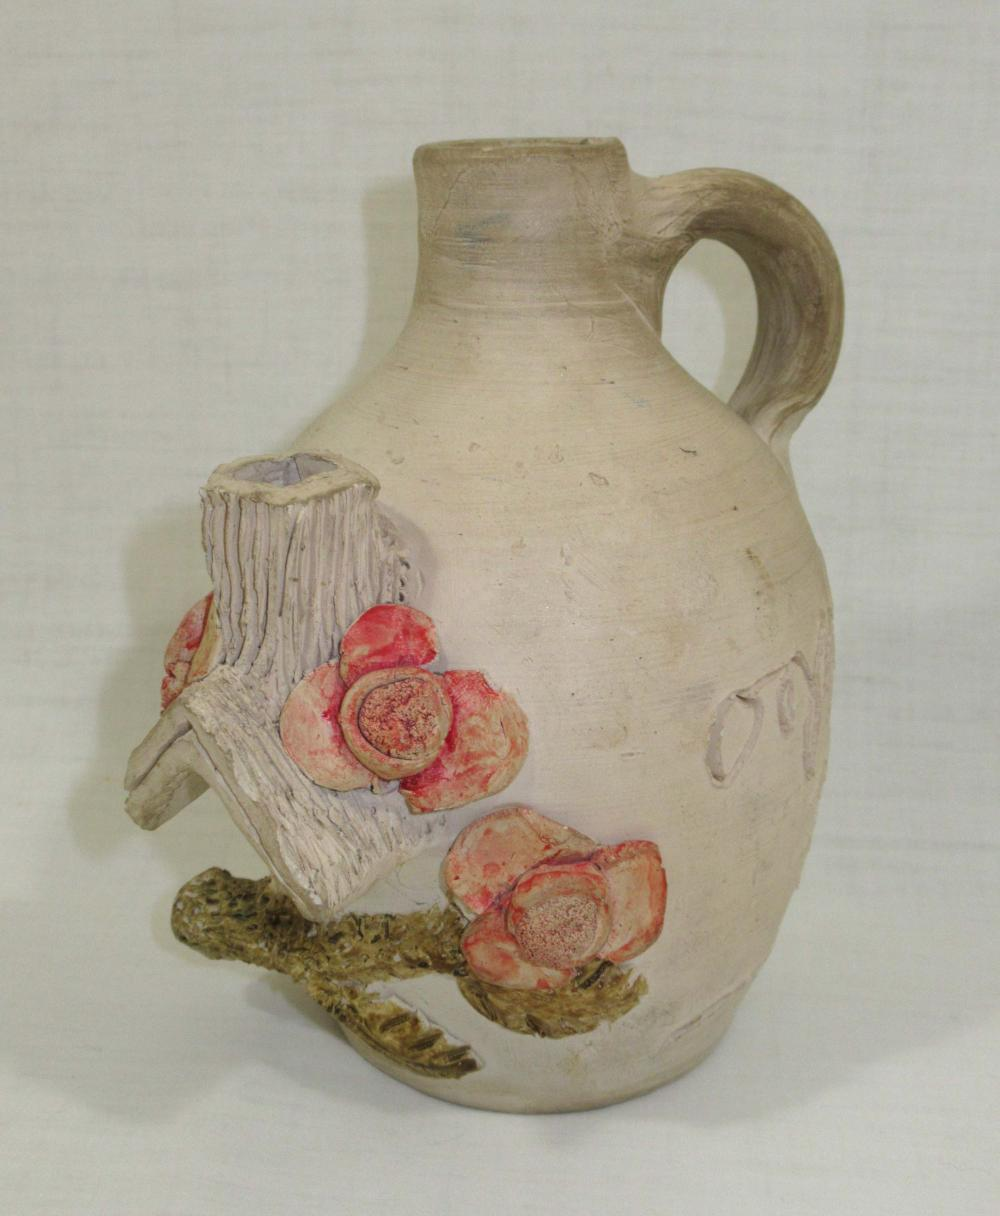 Evans Pottery Birdhouse Jug, Sgnd